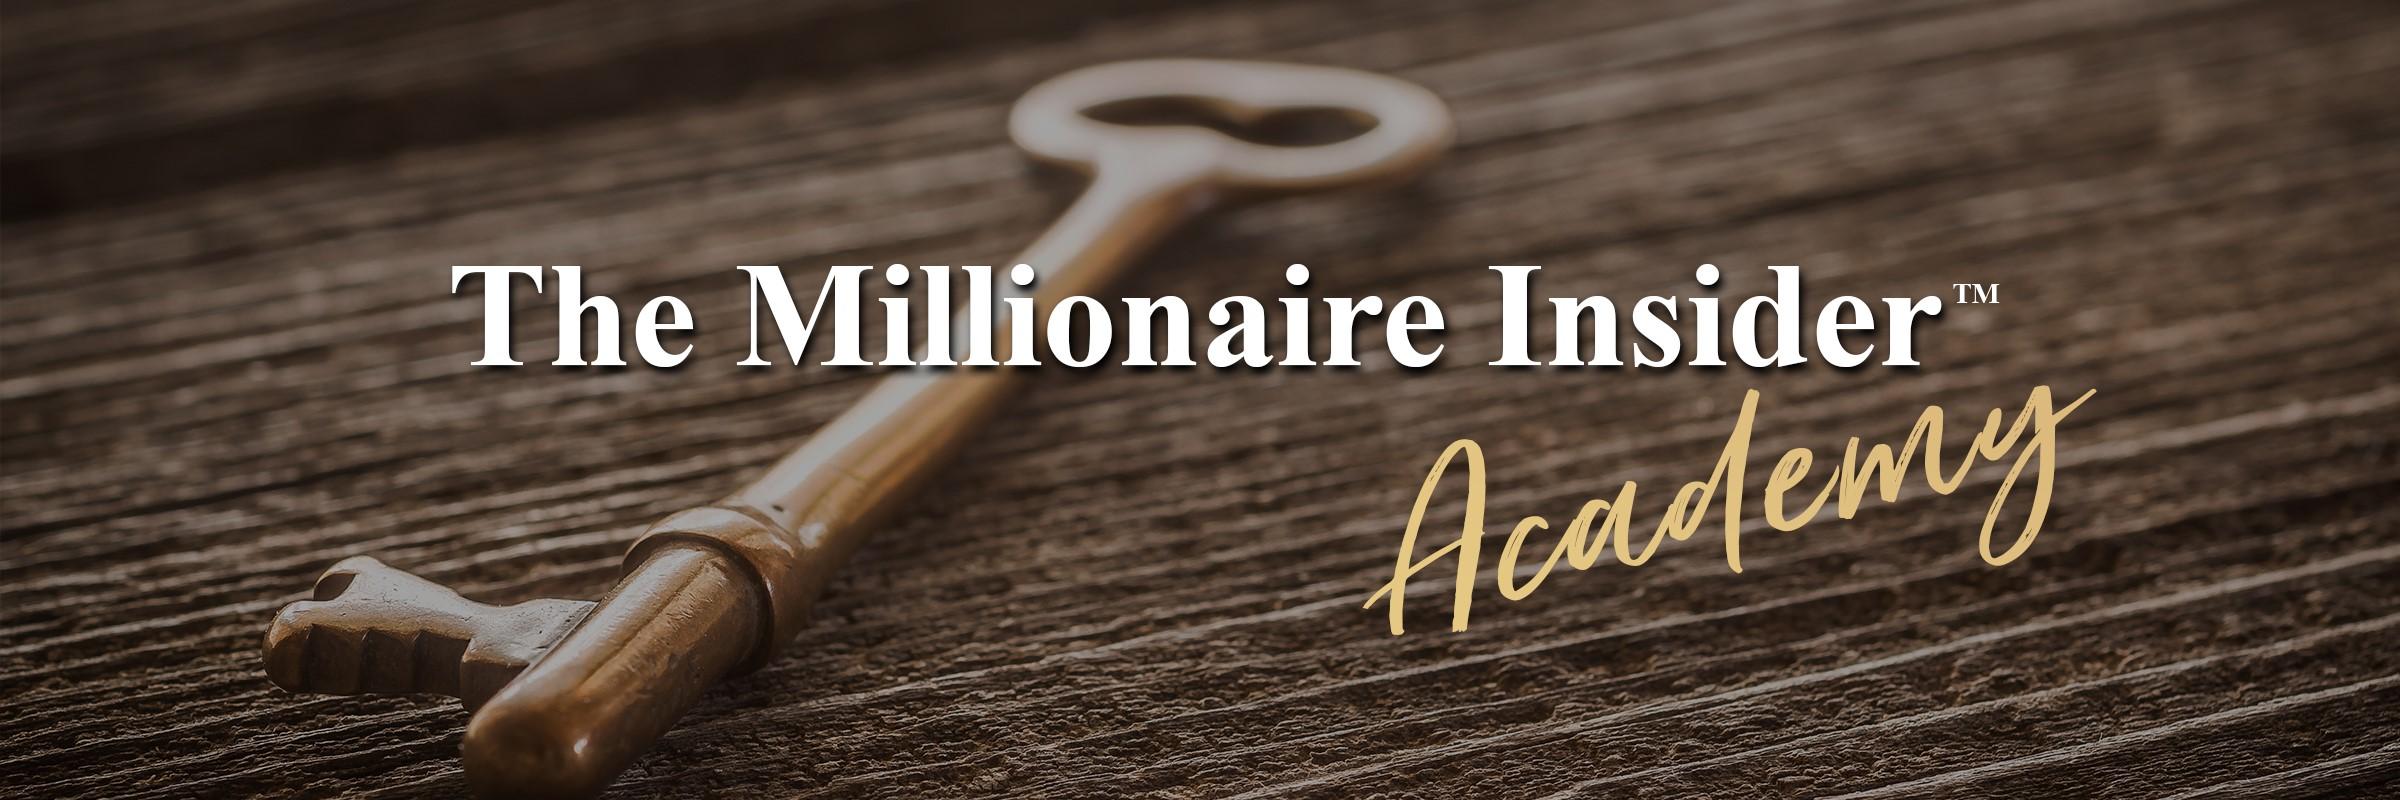 the millionaire insider academy